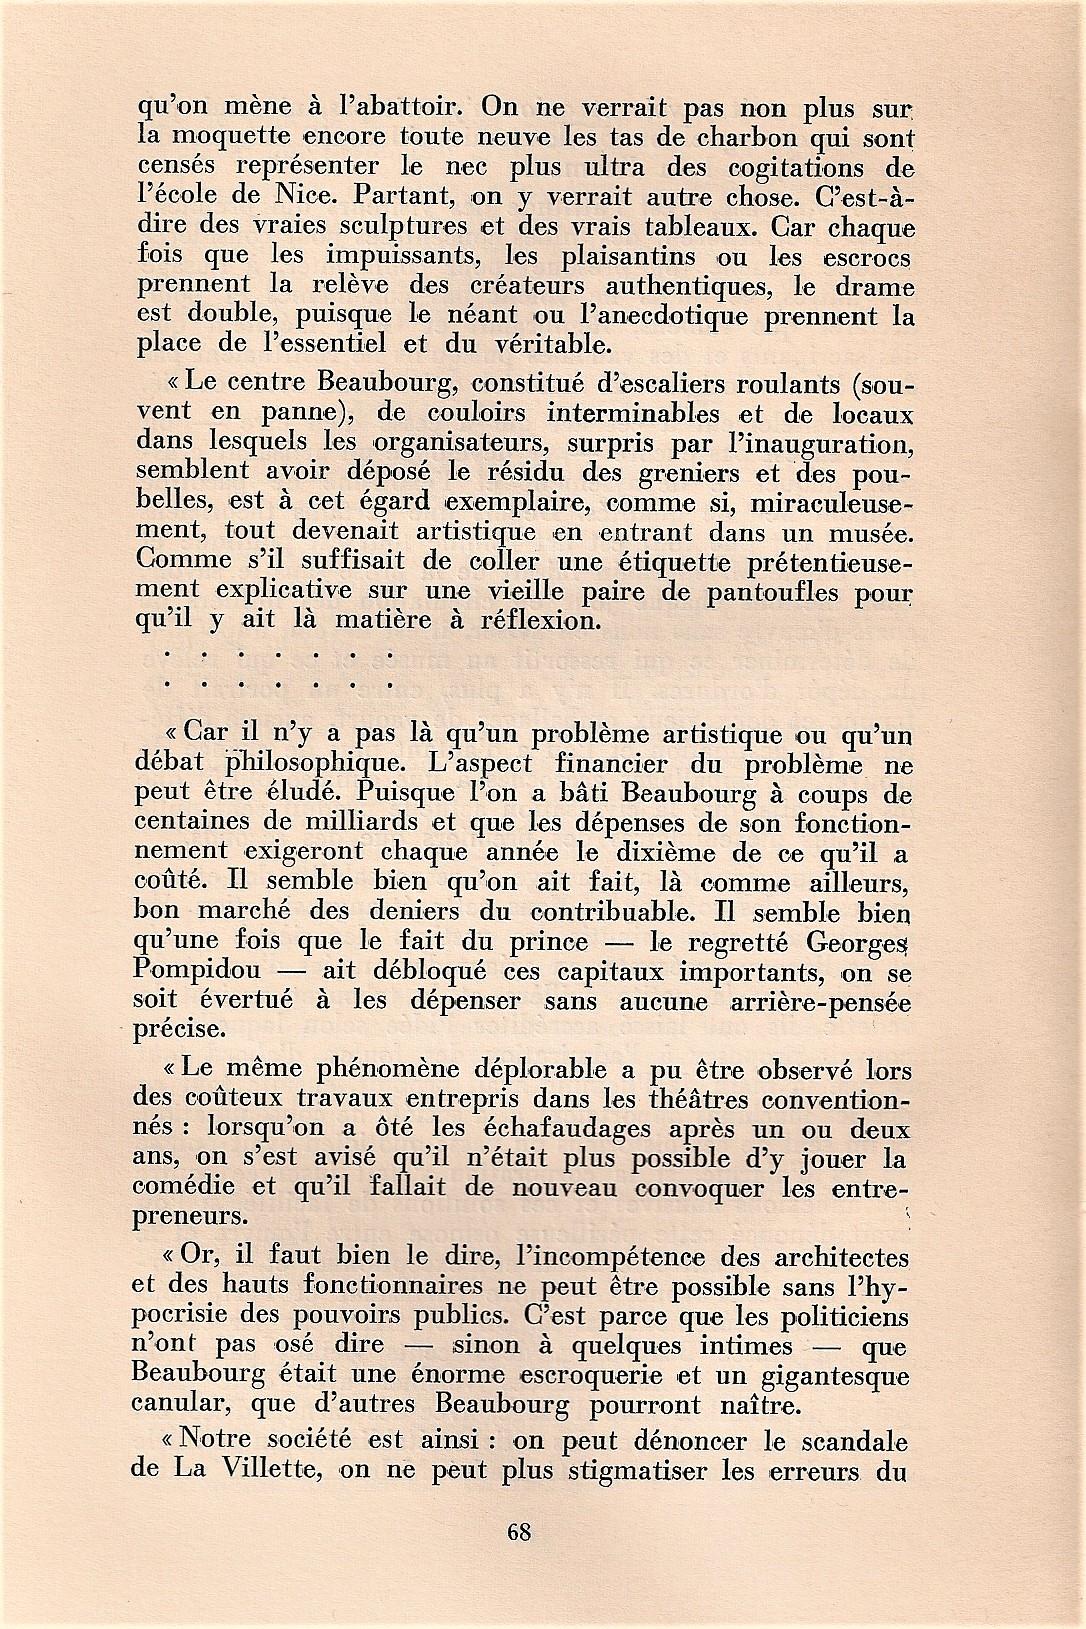 camille-versini-page-68.jpg